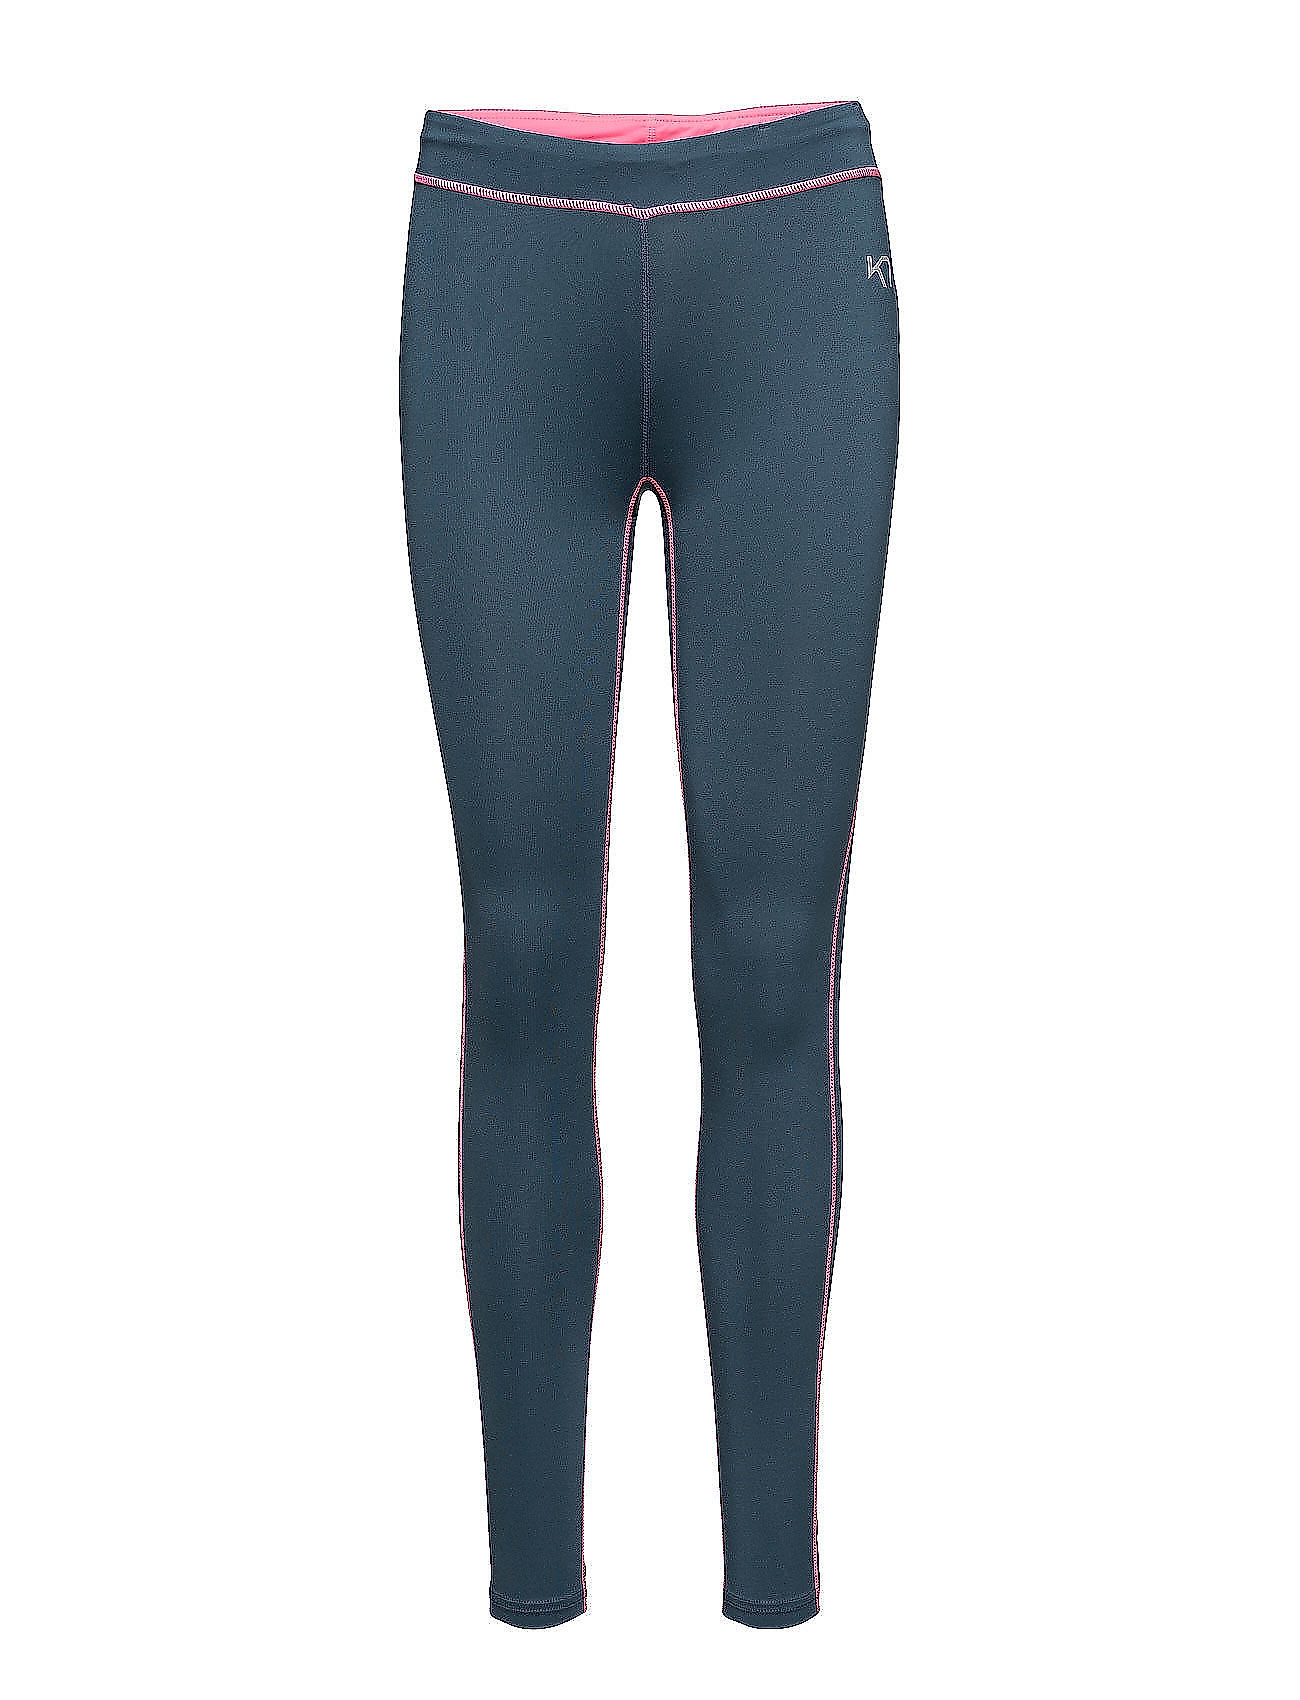 Nora Tights Kari Traa Sportstøj til Kvinder i Navy blå